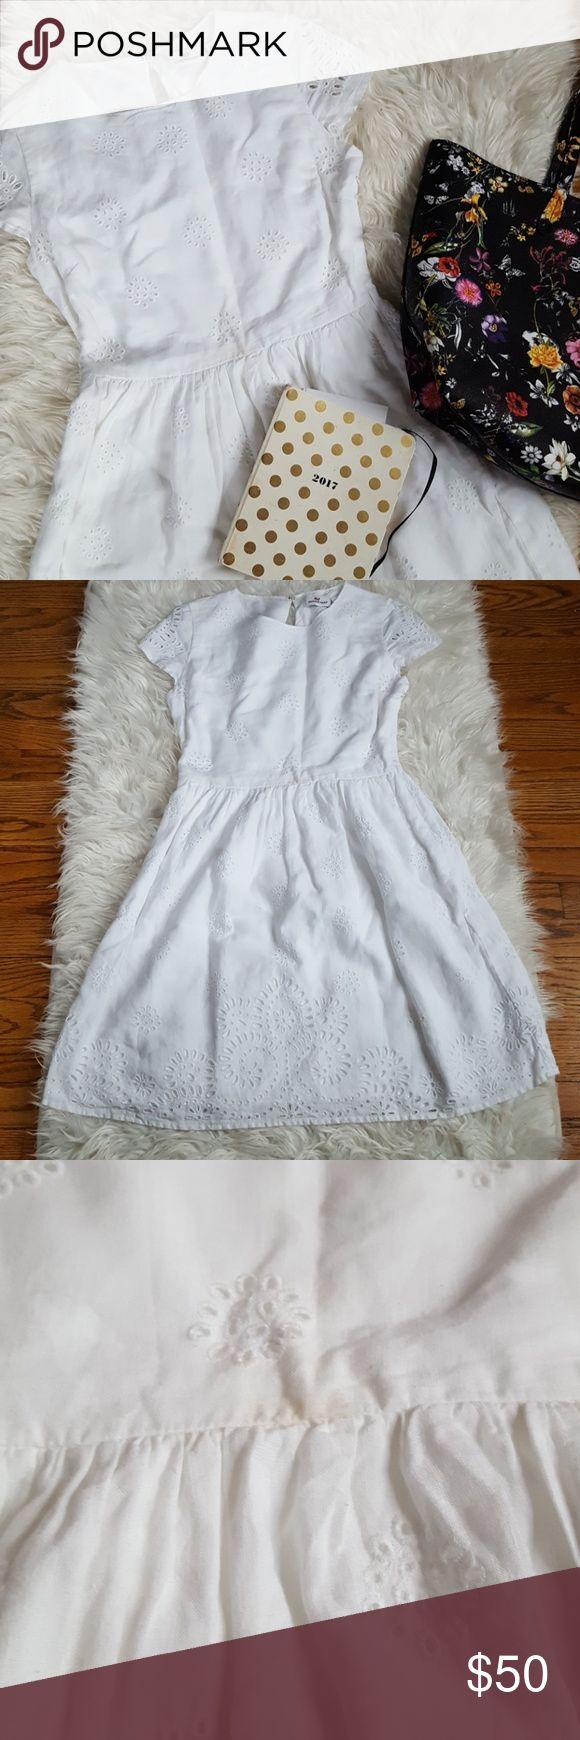 Vineyard Vines white eyelet dress Vineyard Vines  Size 0 Dress  Perfect for weddings  Price is FIRM 🌵🌵🌵🌵 Vineyard Vines Dresses Mini